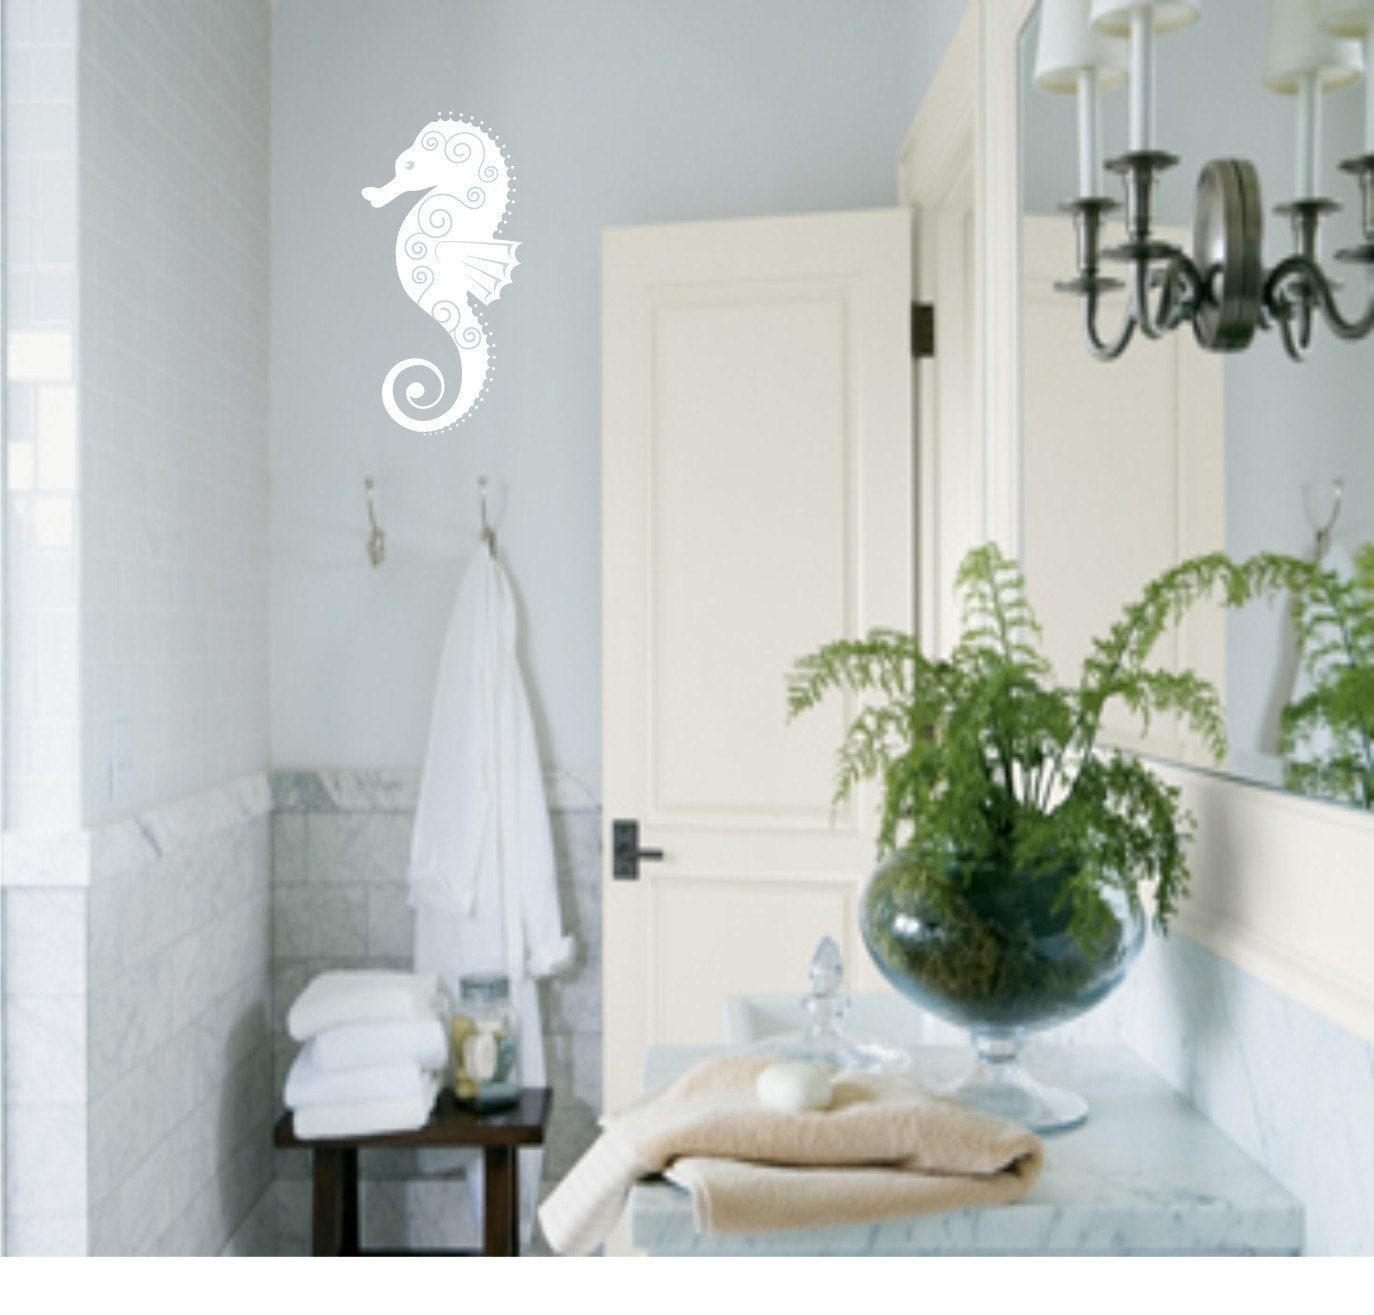 Horse Bathroom Decor Quotes